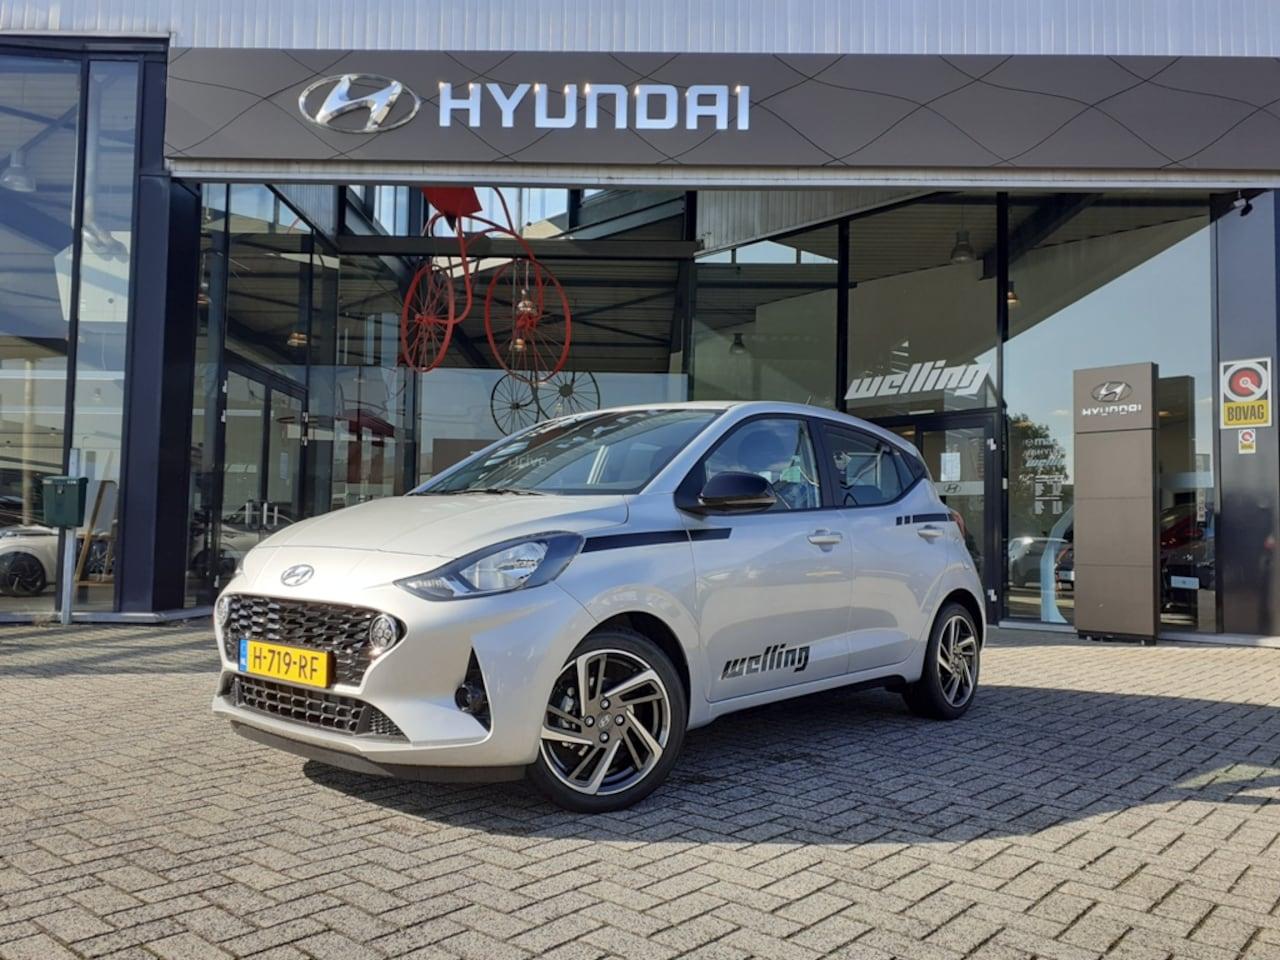 Hyundai i10 - 1.0i Comfort/16 inch Lichtmetalen velgen/Striping/Skirts - AutoWereld.nl